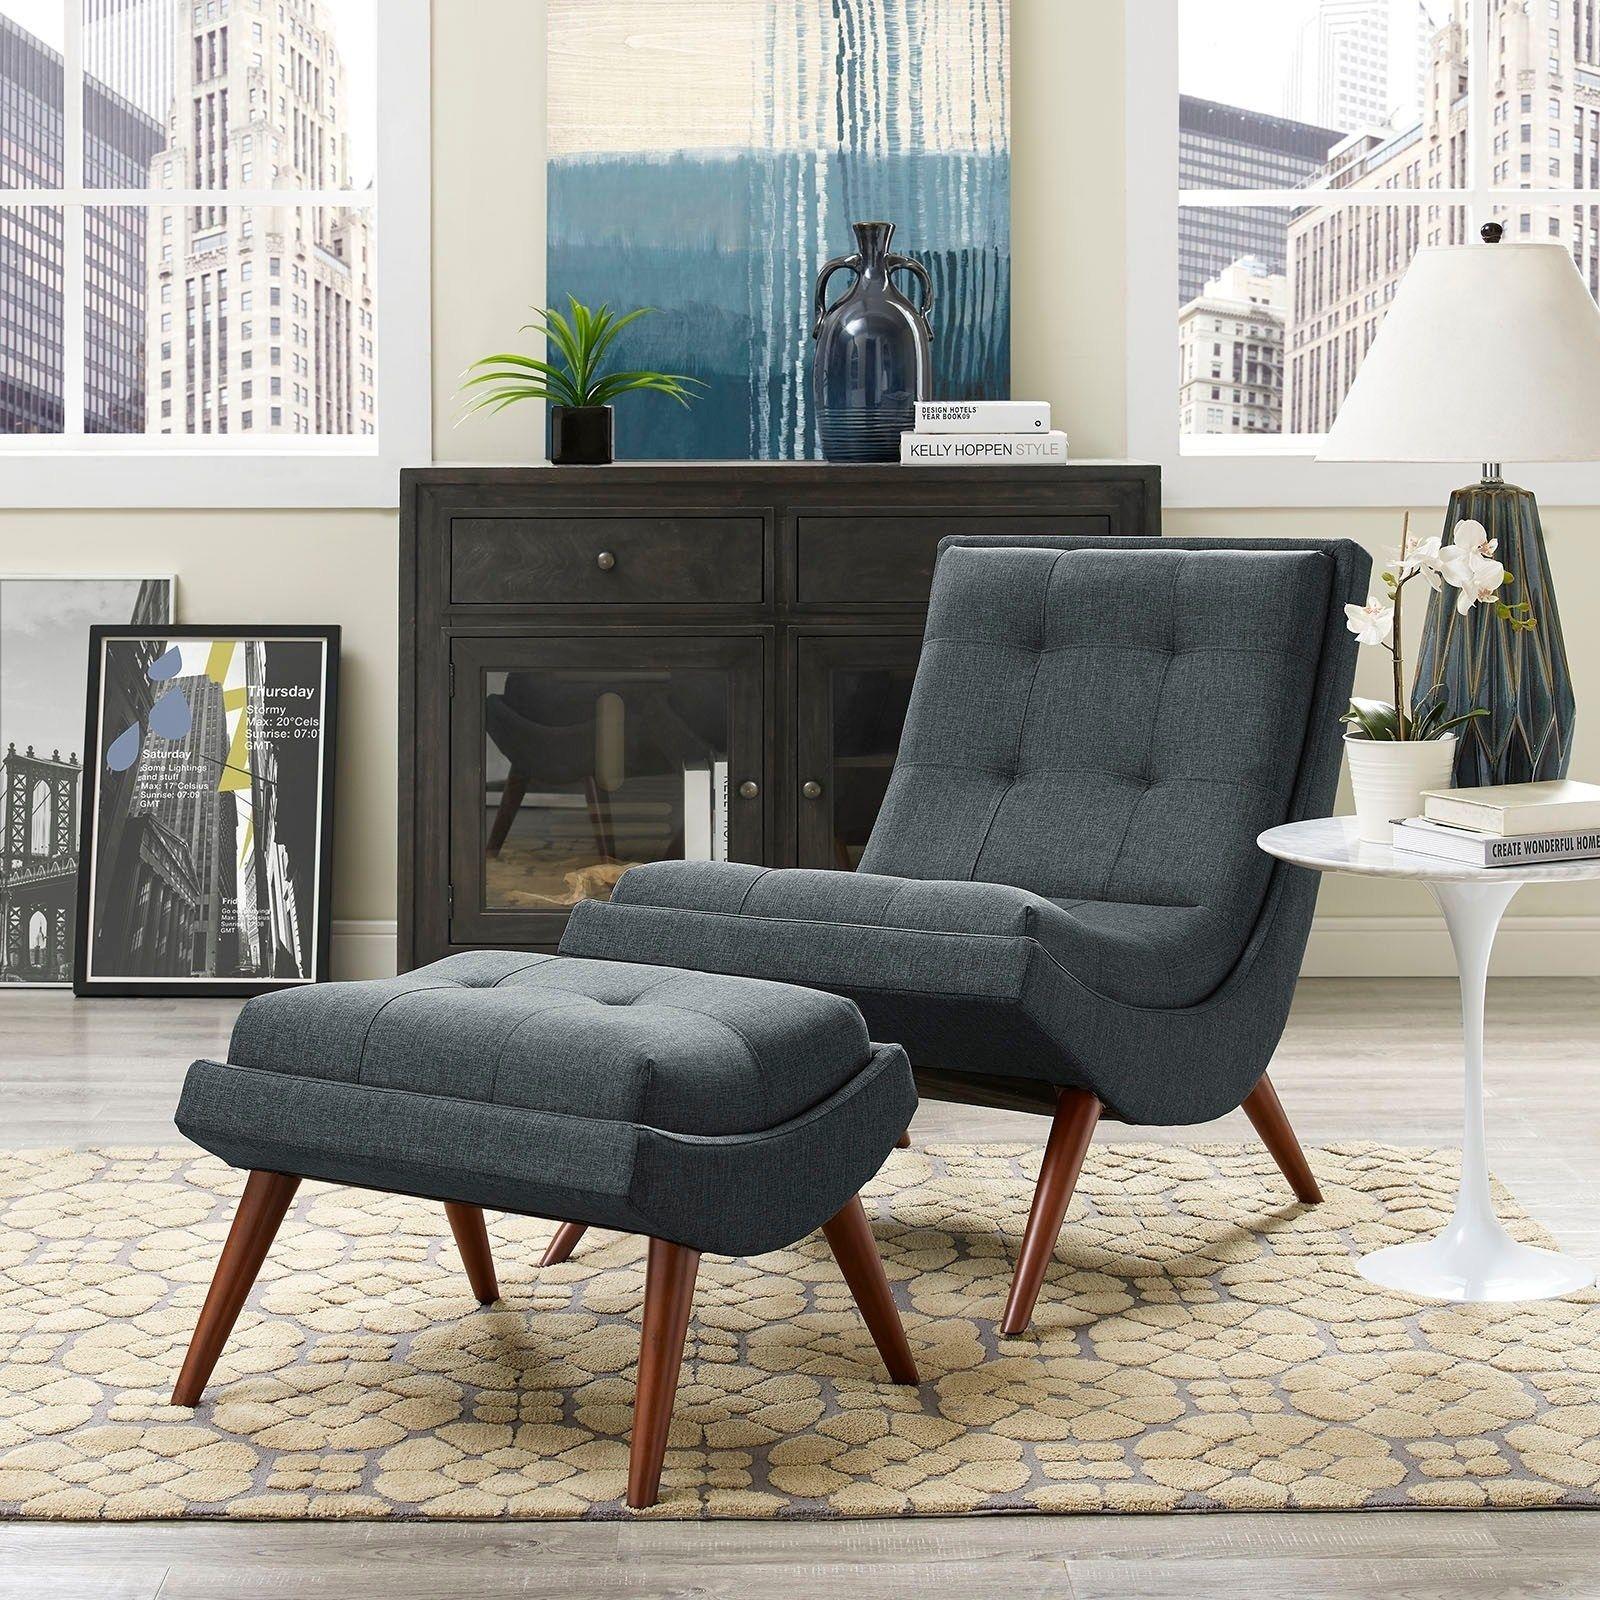 Modway Ramp Mid Century Fabric Lounge Chair Set (Grey)